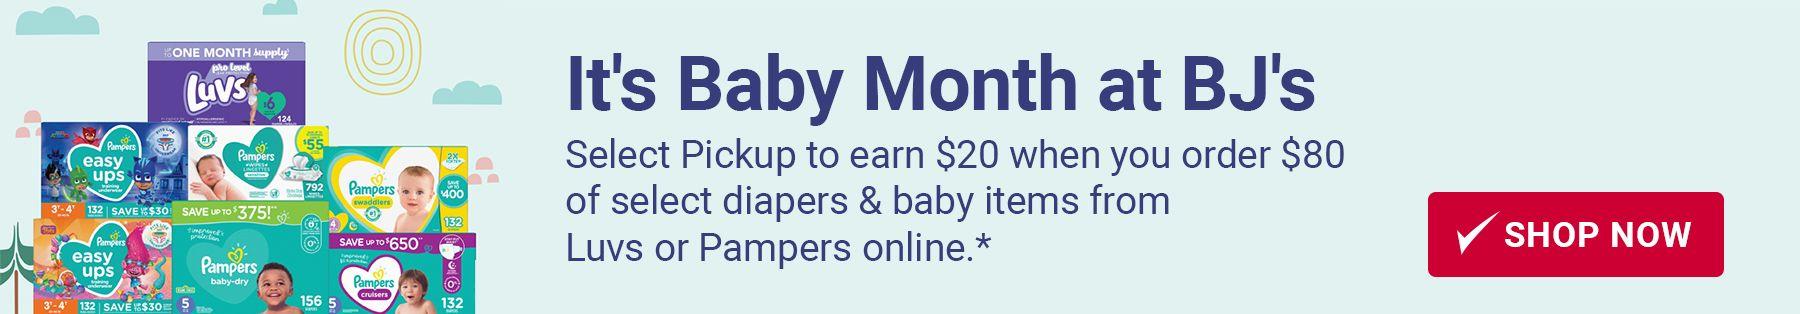 Pickup Diapers at BJs Curbside Pickup